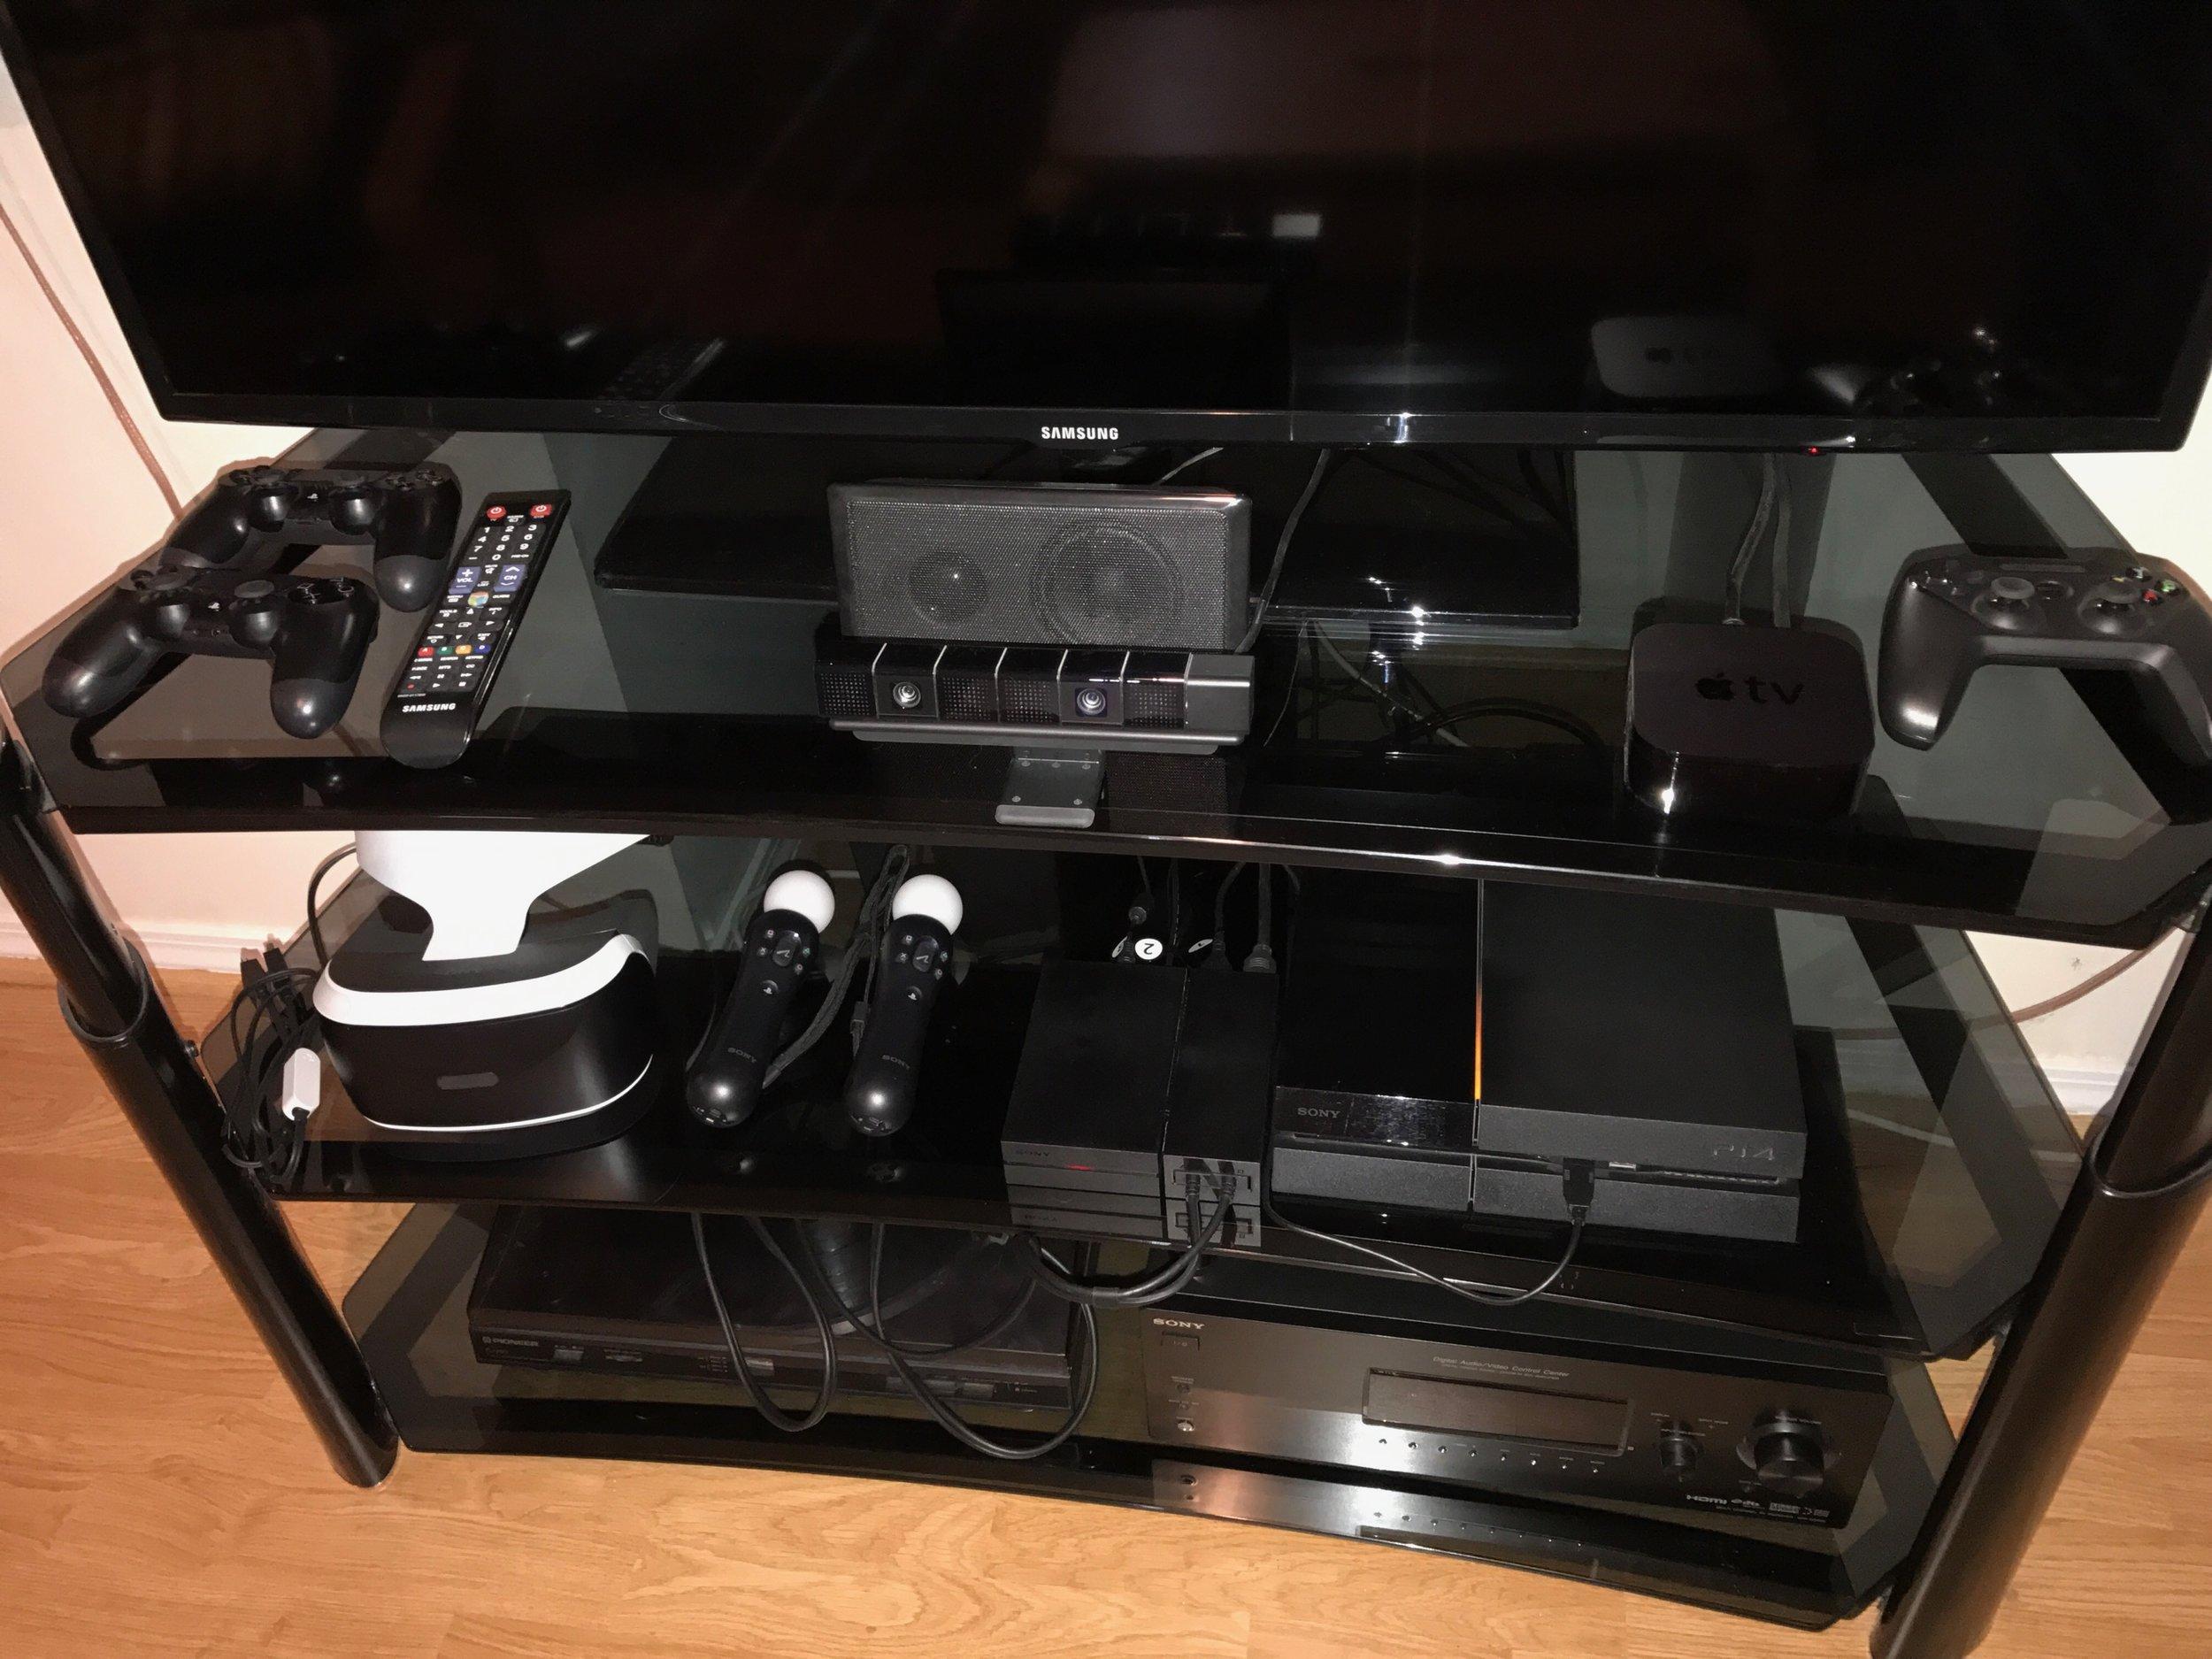 Chris's new Playstation VR set up.